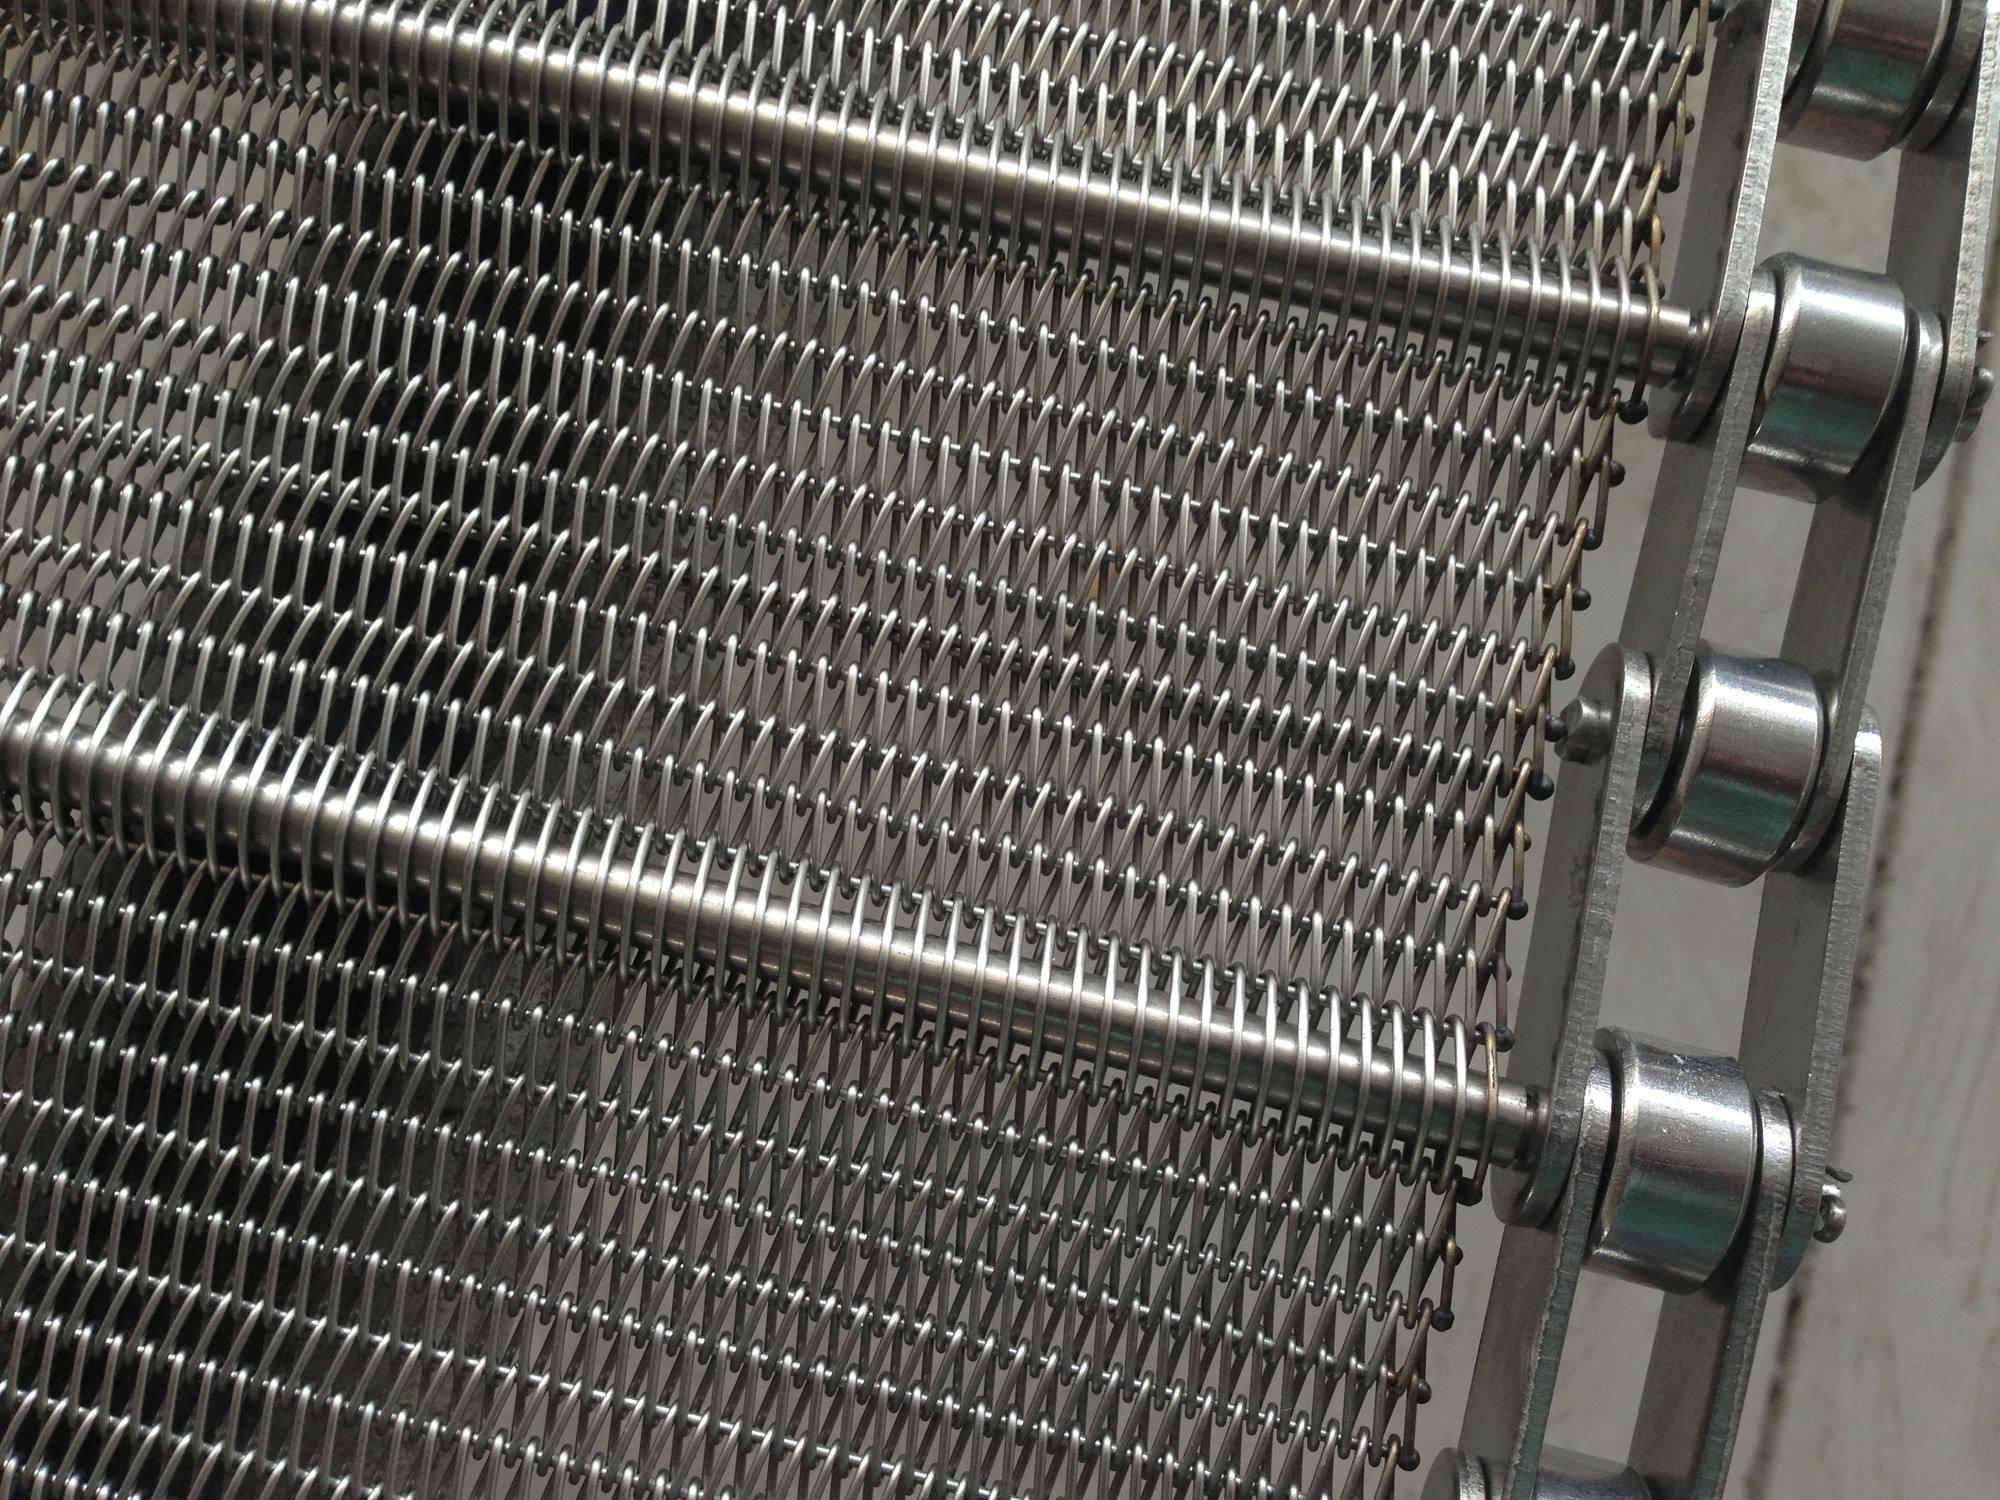 Why does the conveyor belt slip